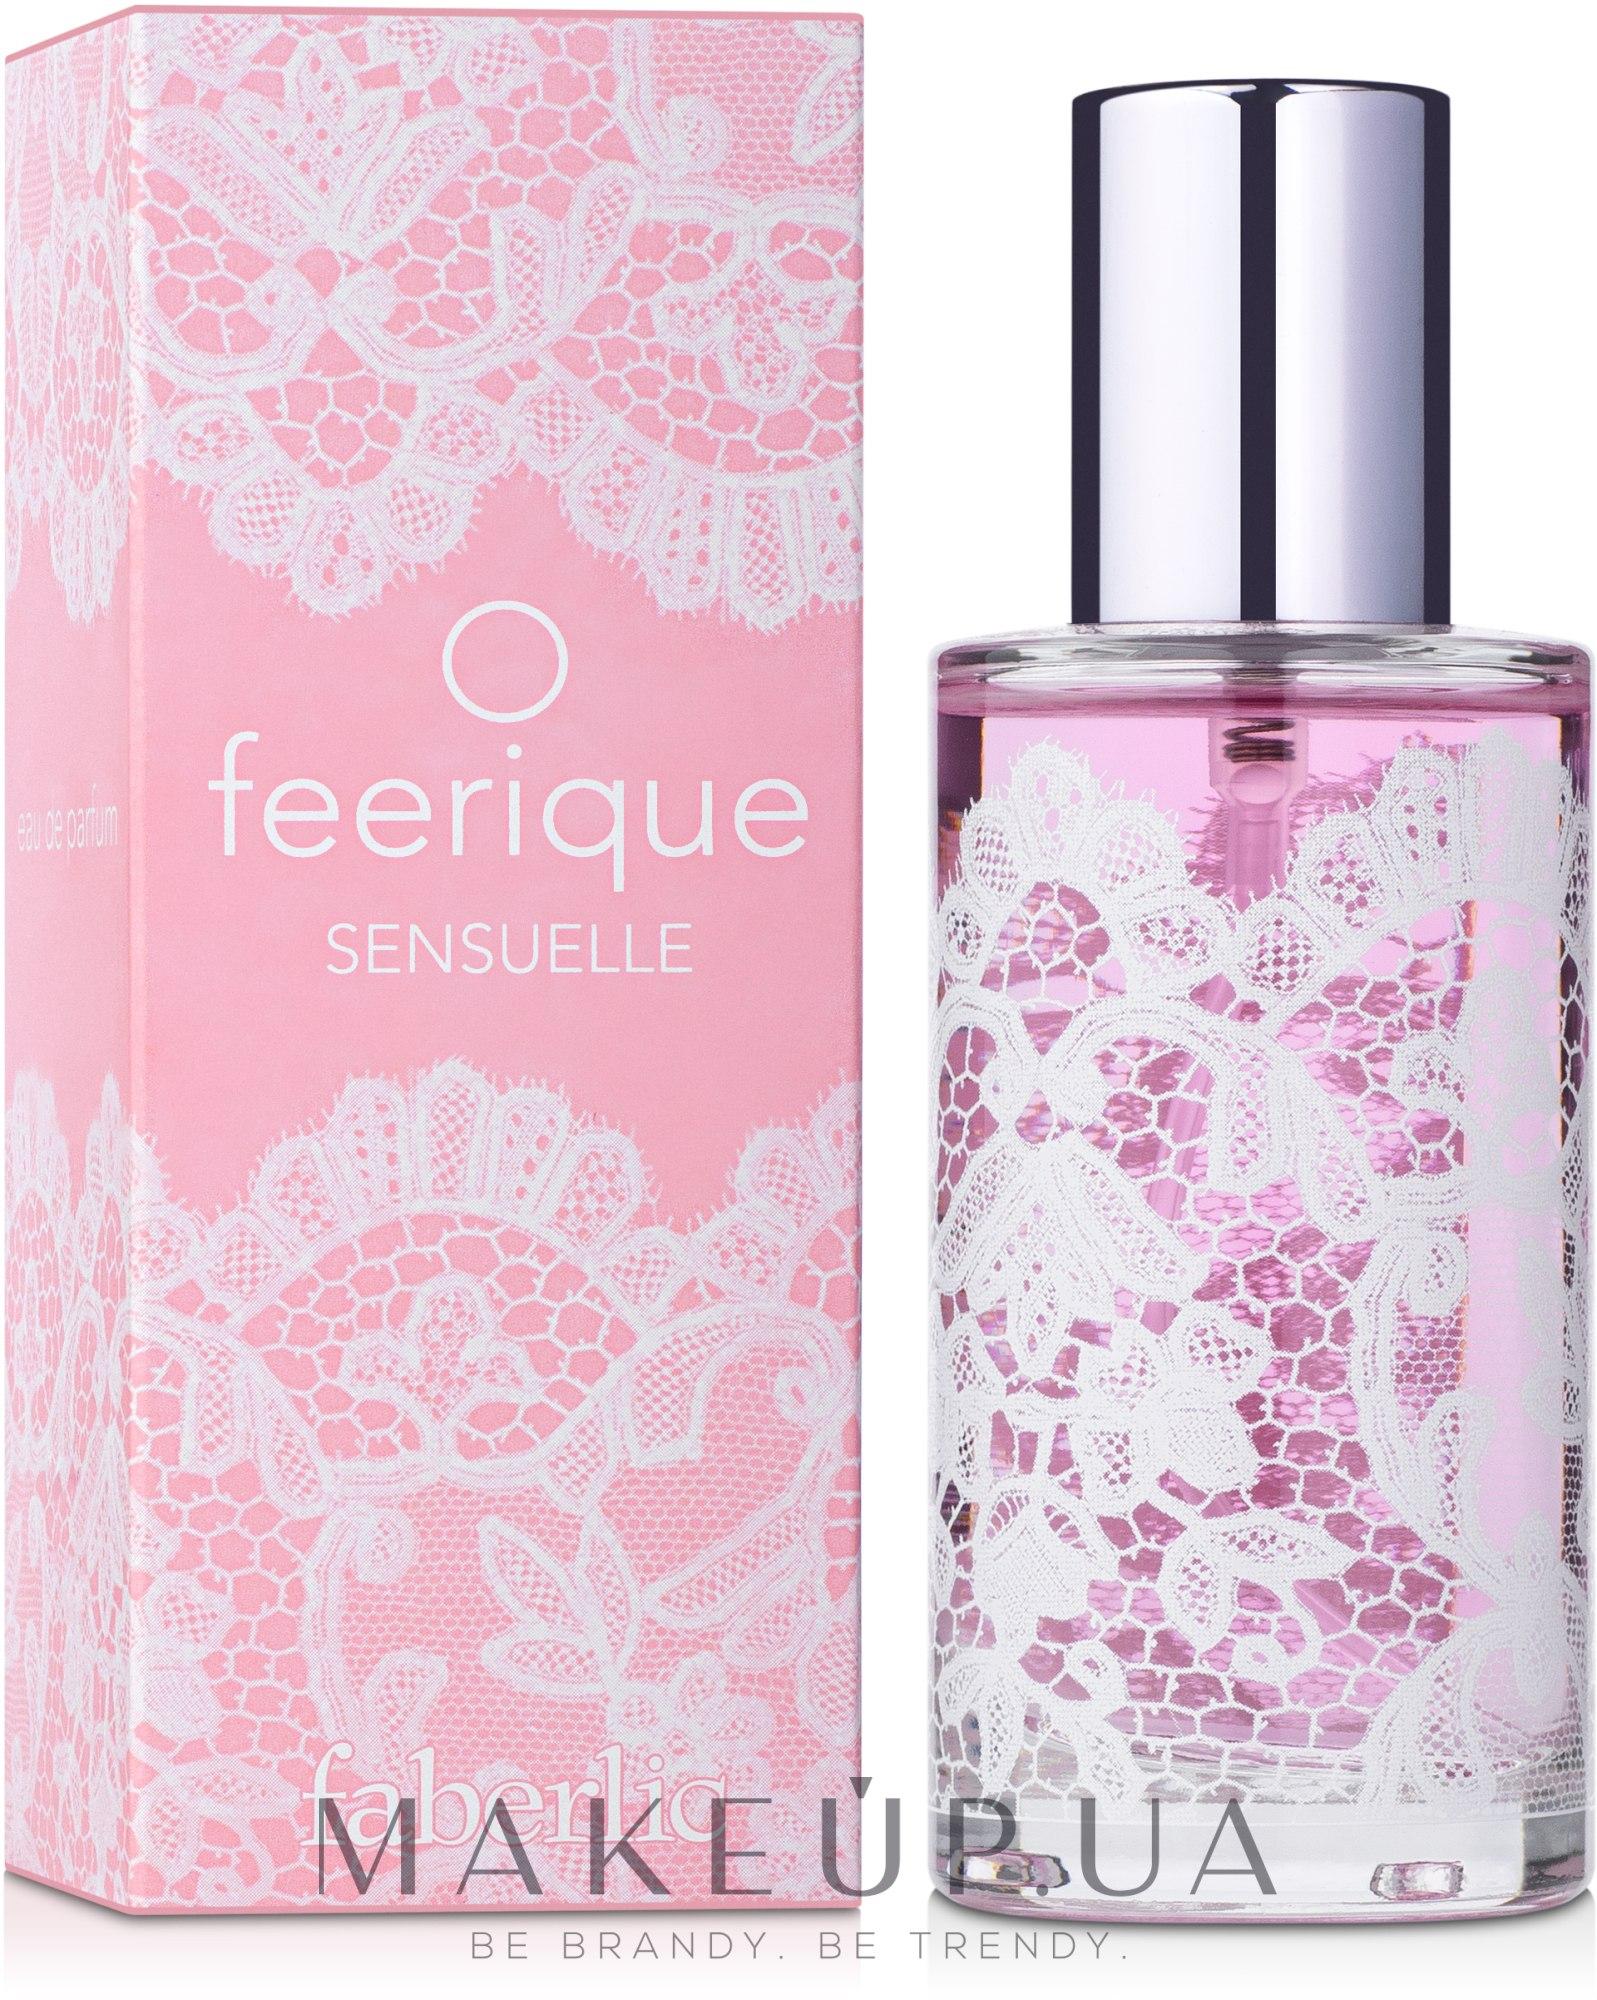 Faberlic O Feerique Sensuelle - Парфюмированная вода — фото 50ml